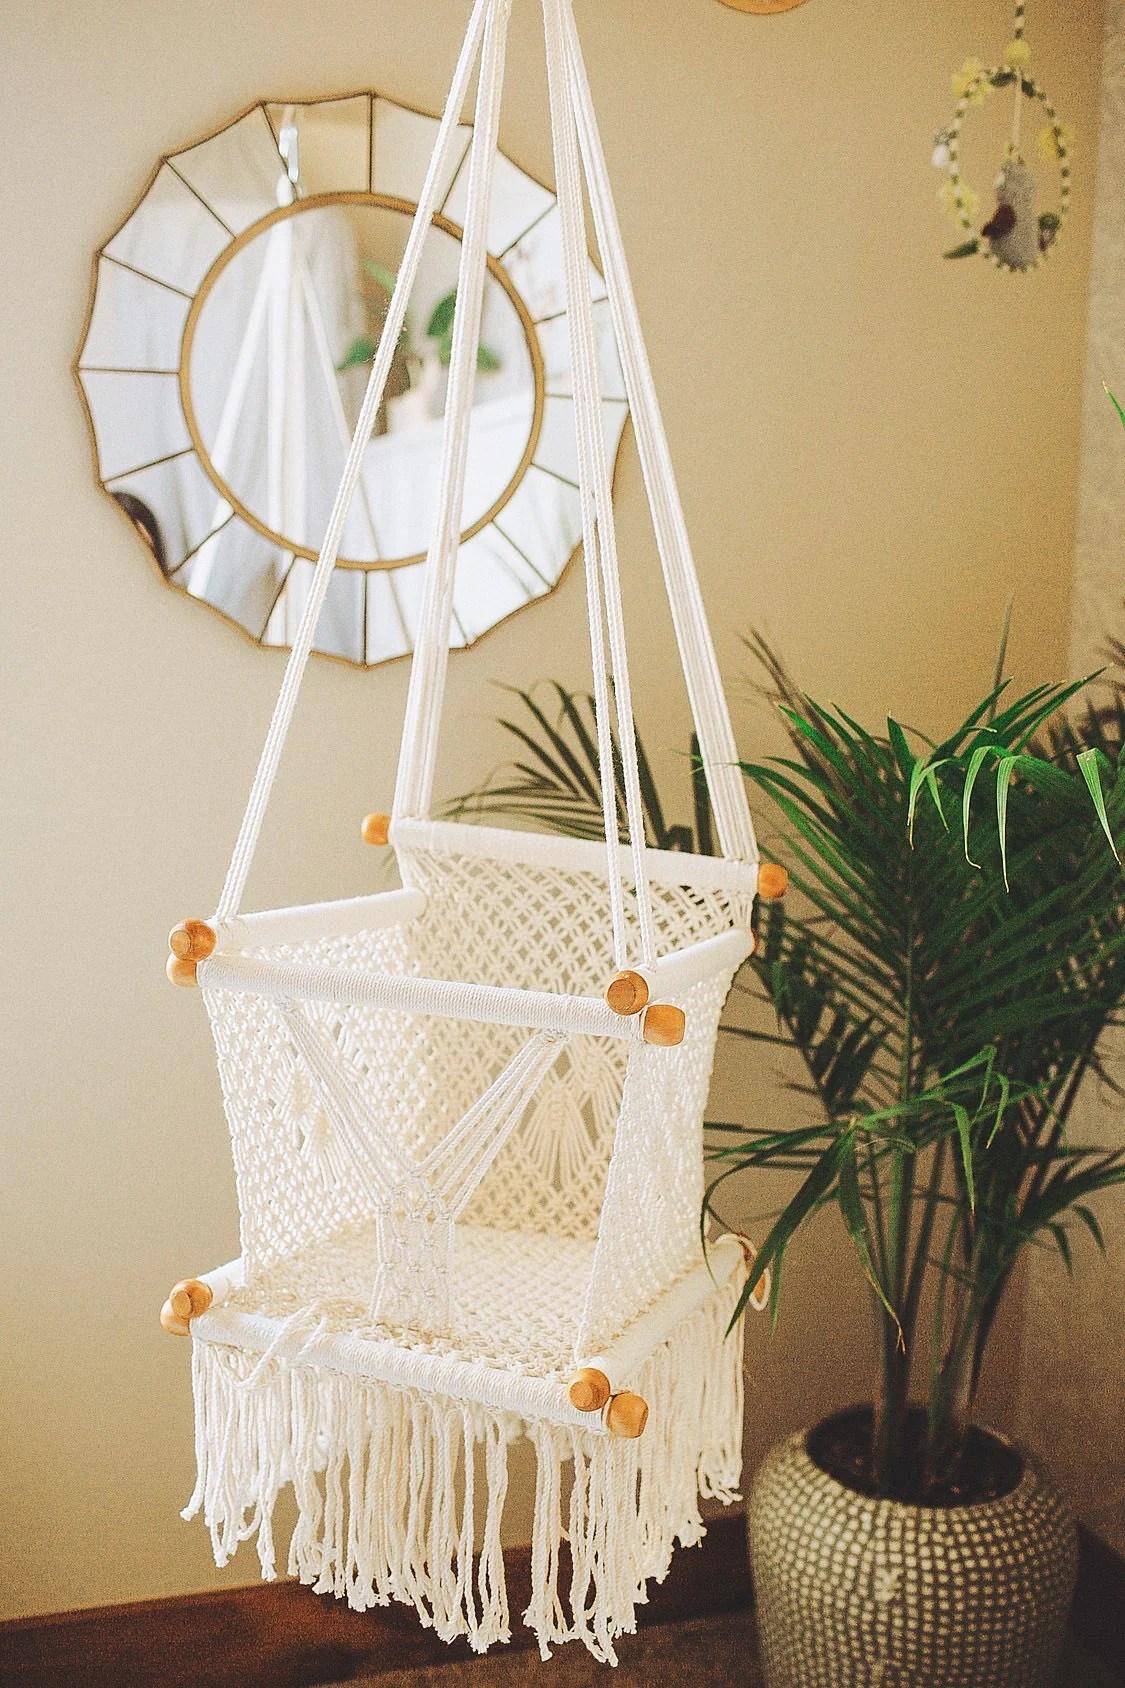 macrame hammock chair snorlax bean bag for sale baby swing handmade in nicaragua